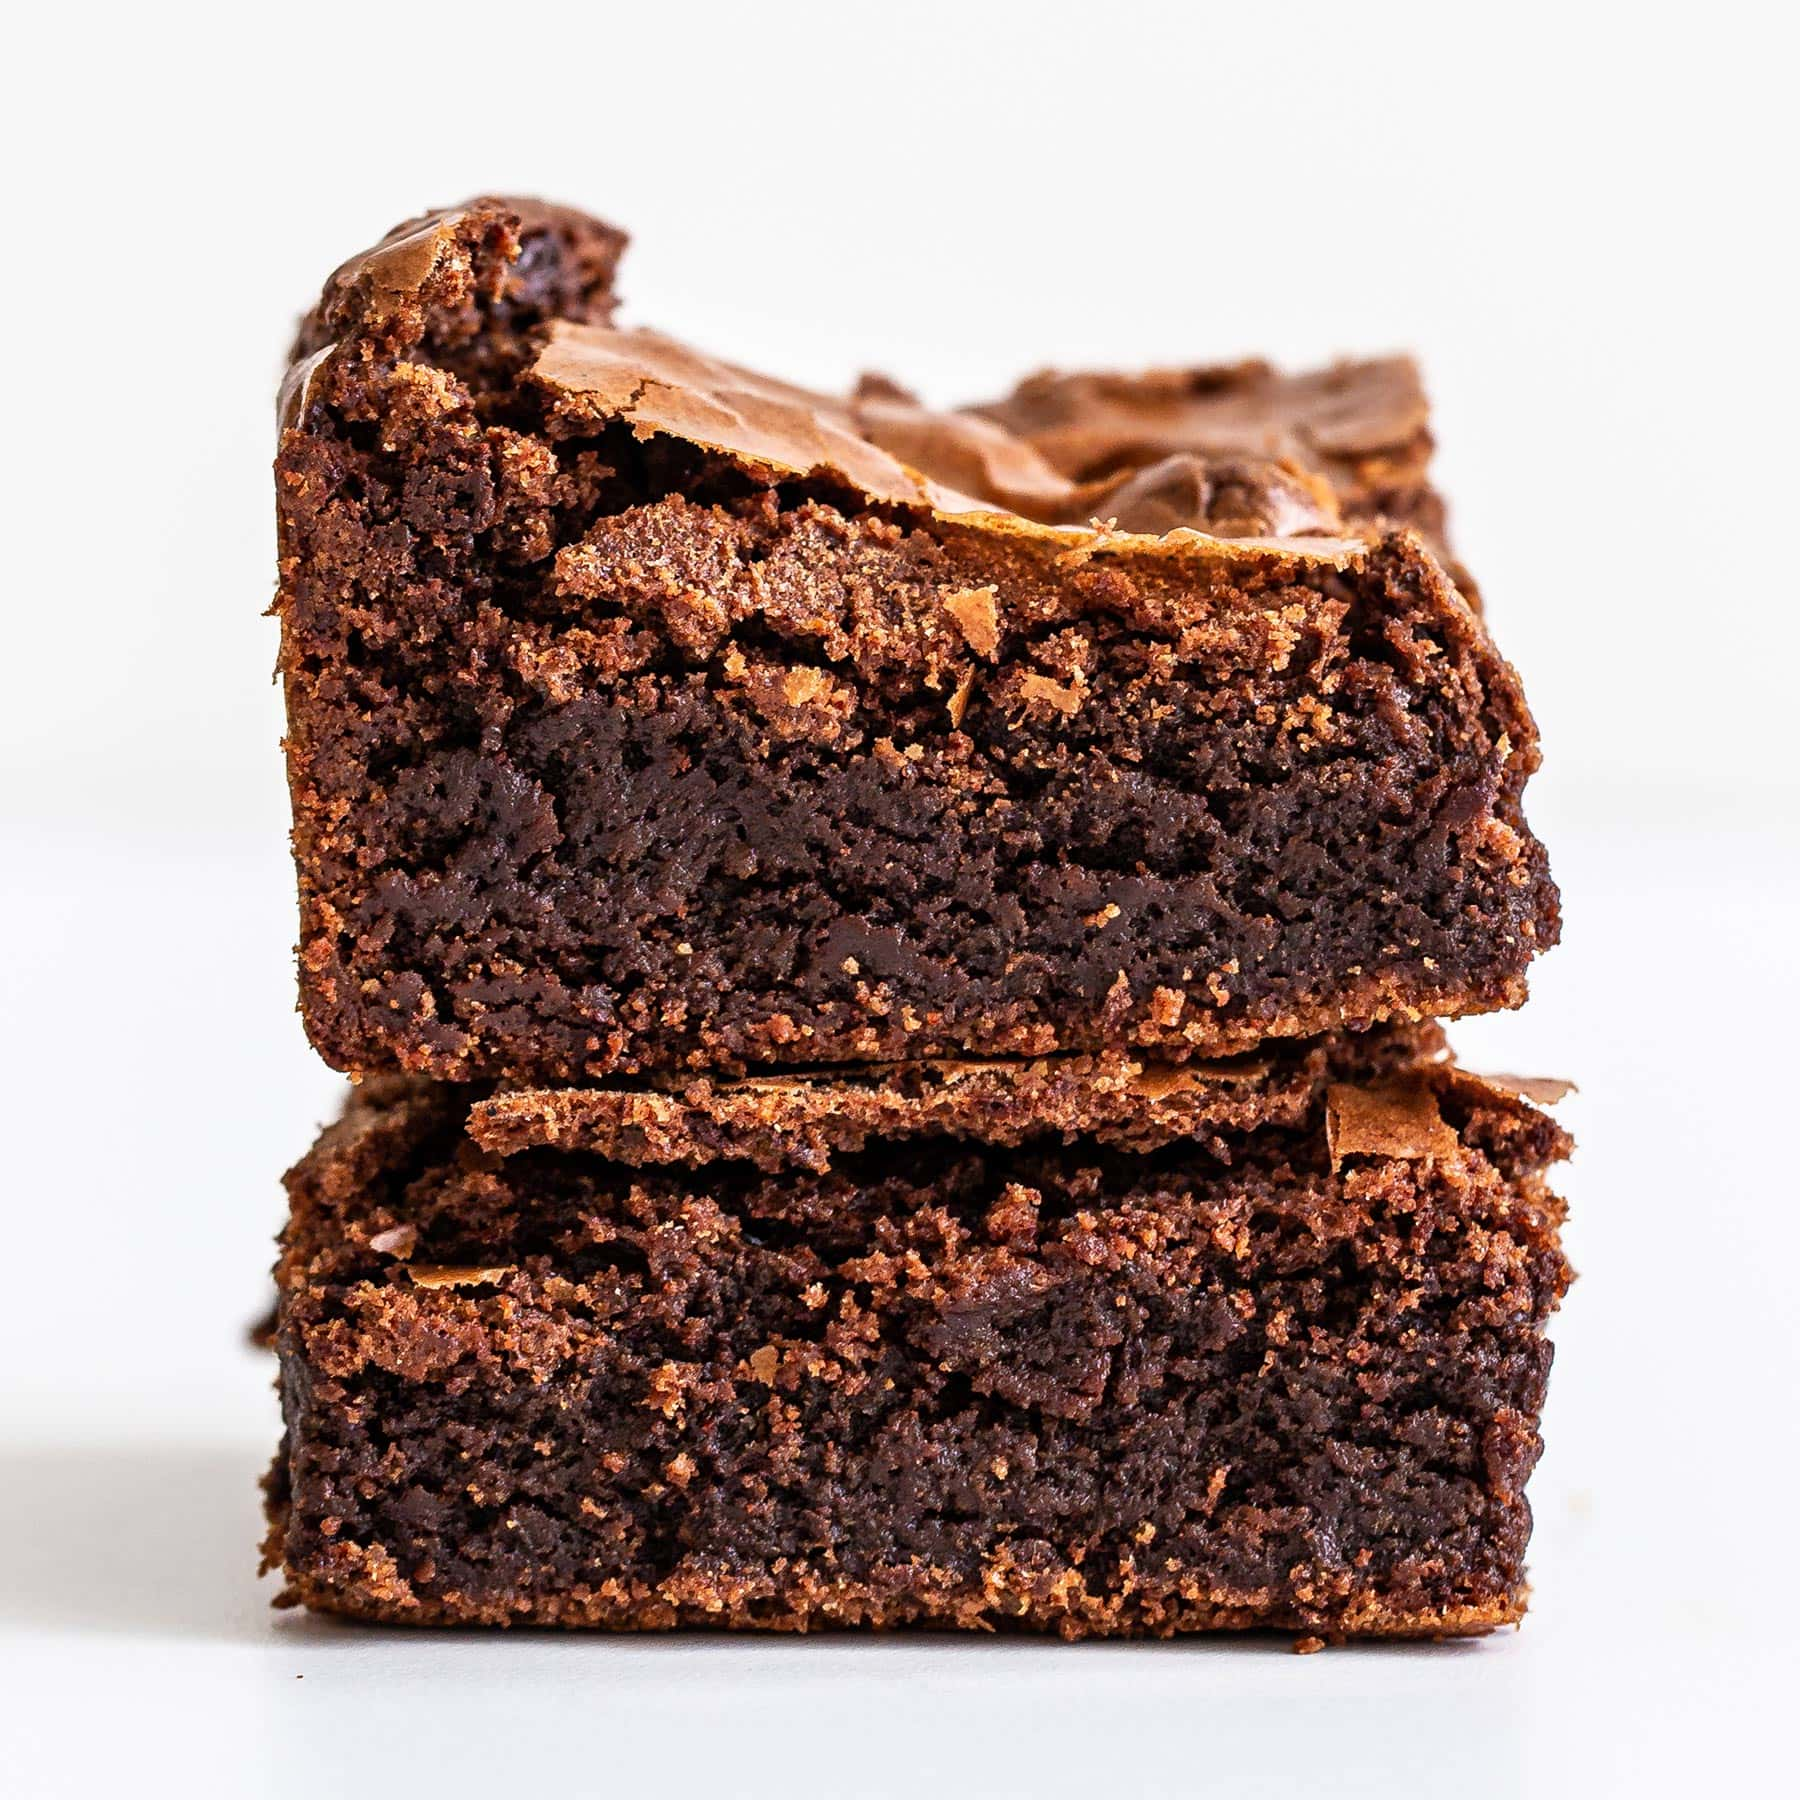 Ultimate-Brownies-01-Square